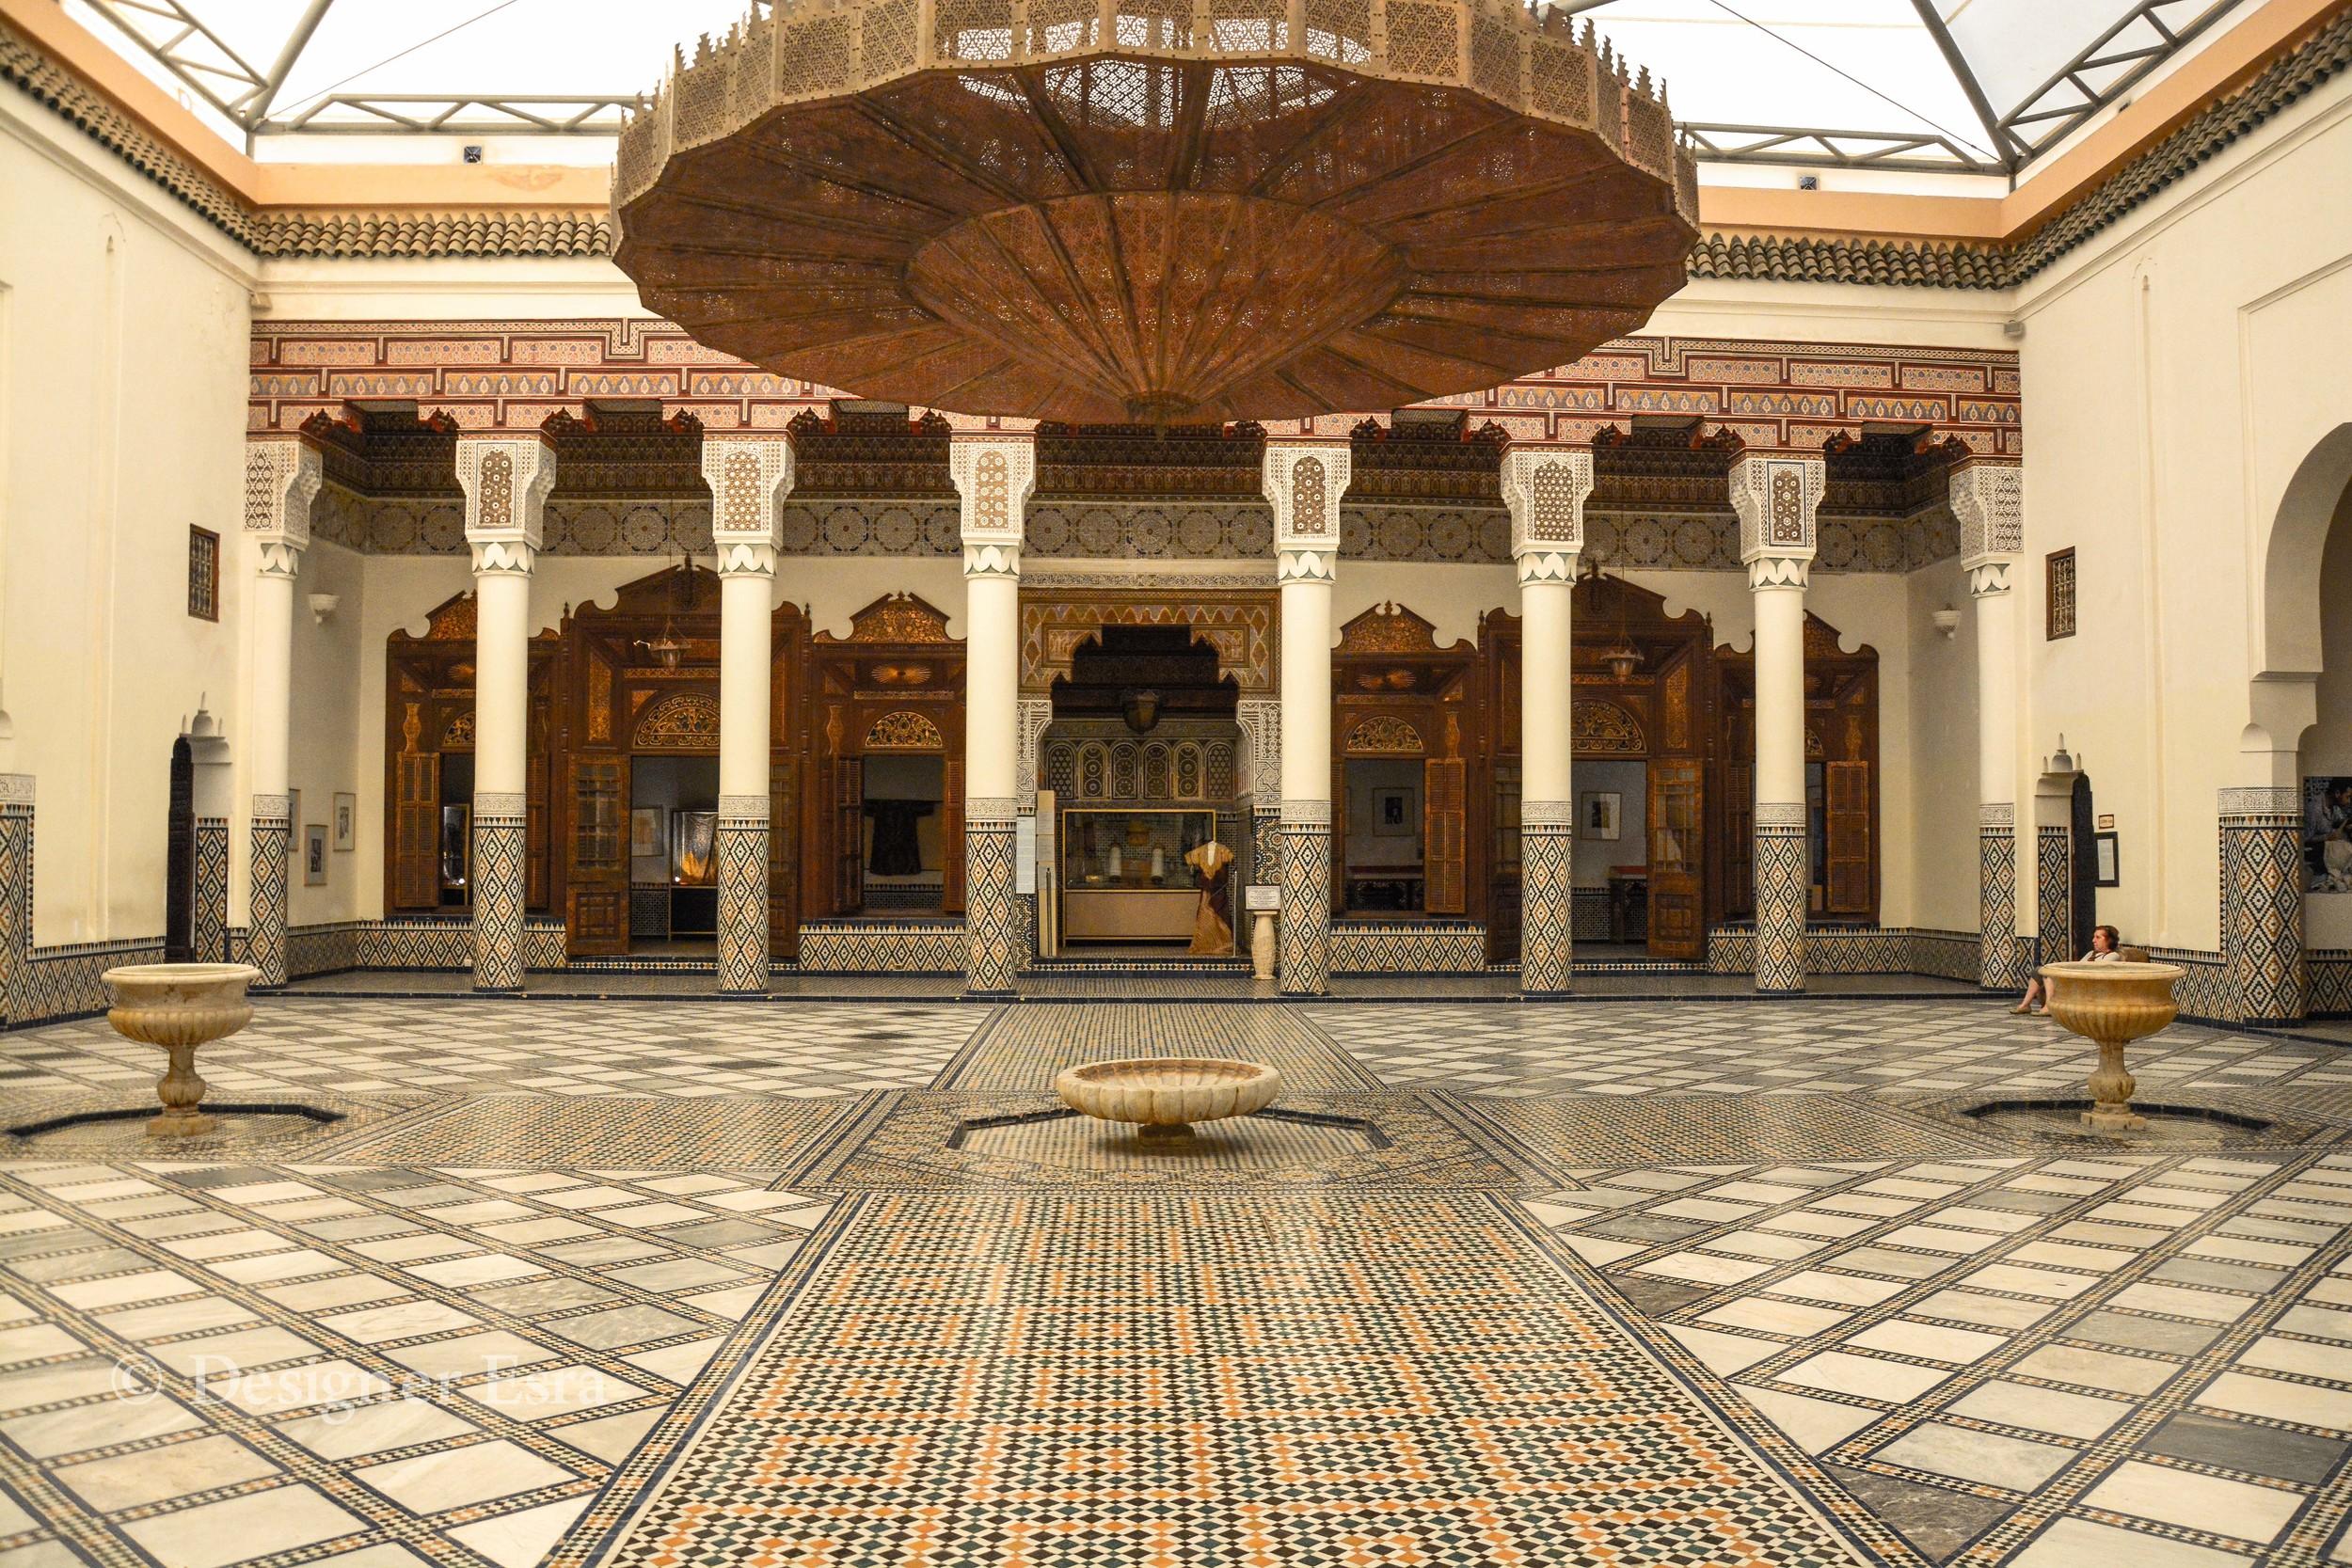 Islamic Pattern in the Museum of Marrakech